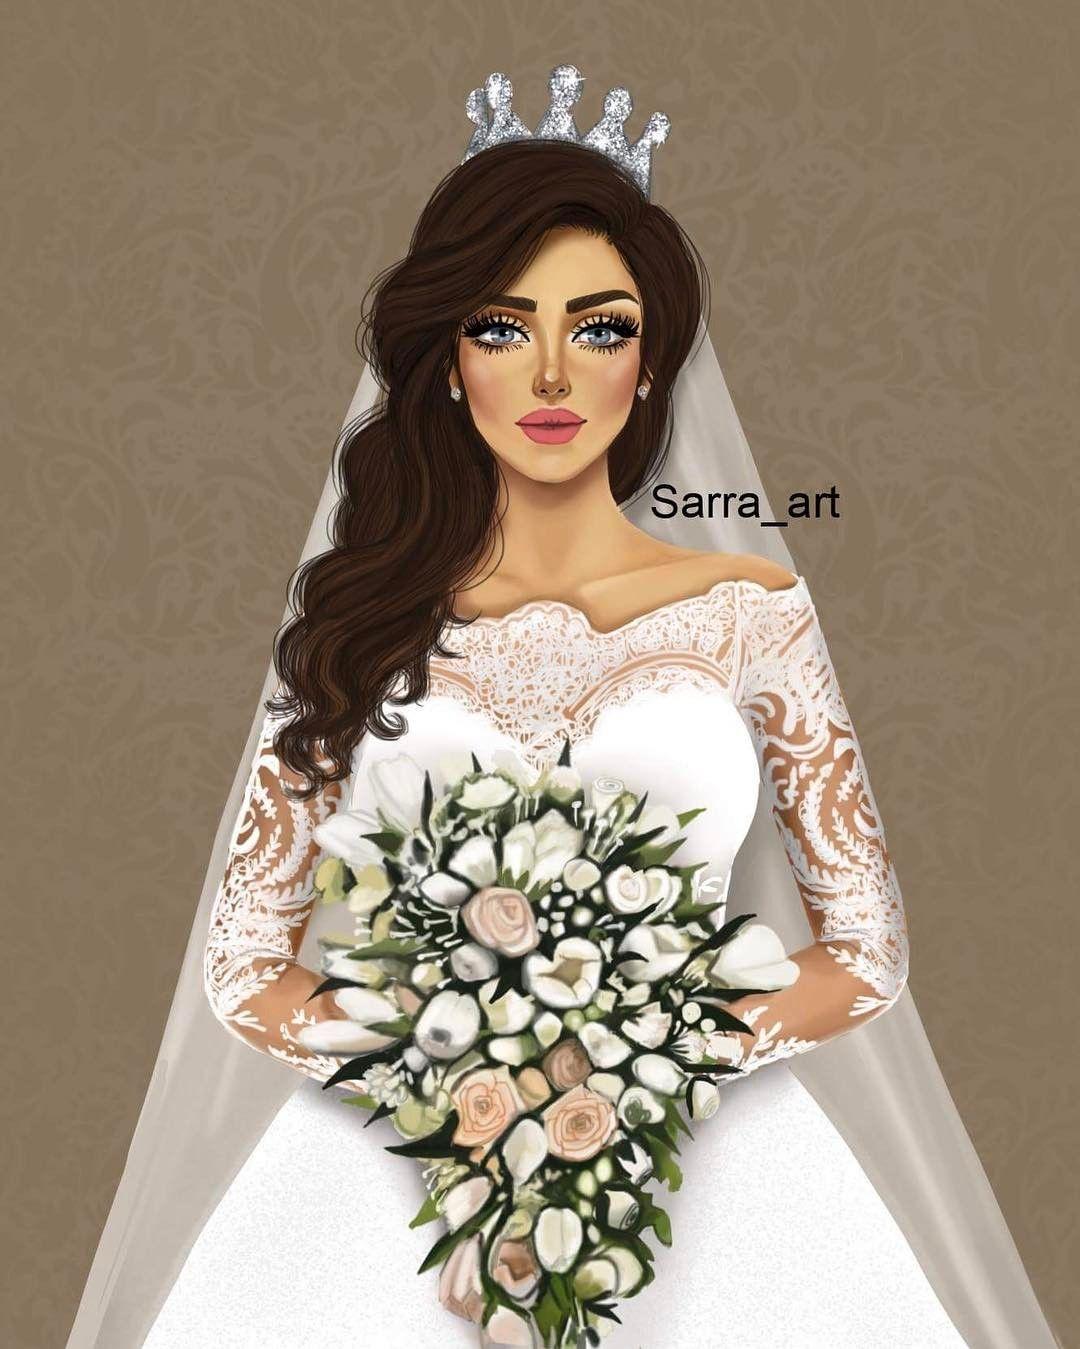 Image May Contain 1 Person Sarra Art Girly Art Digital Art Girl